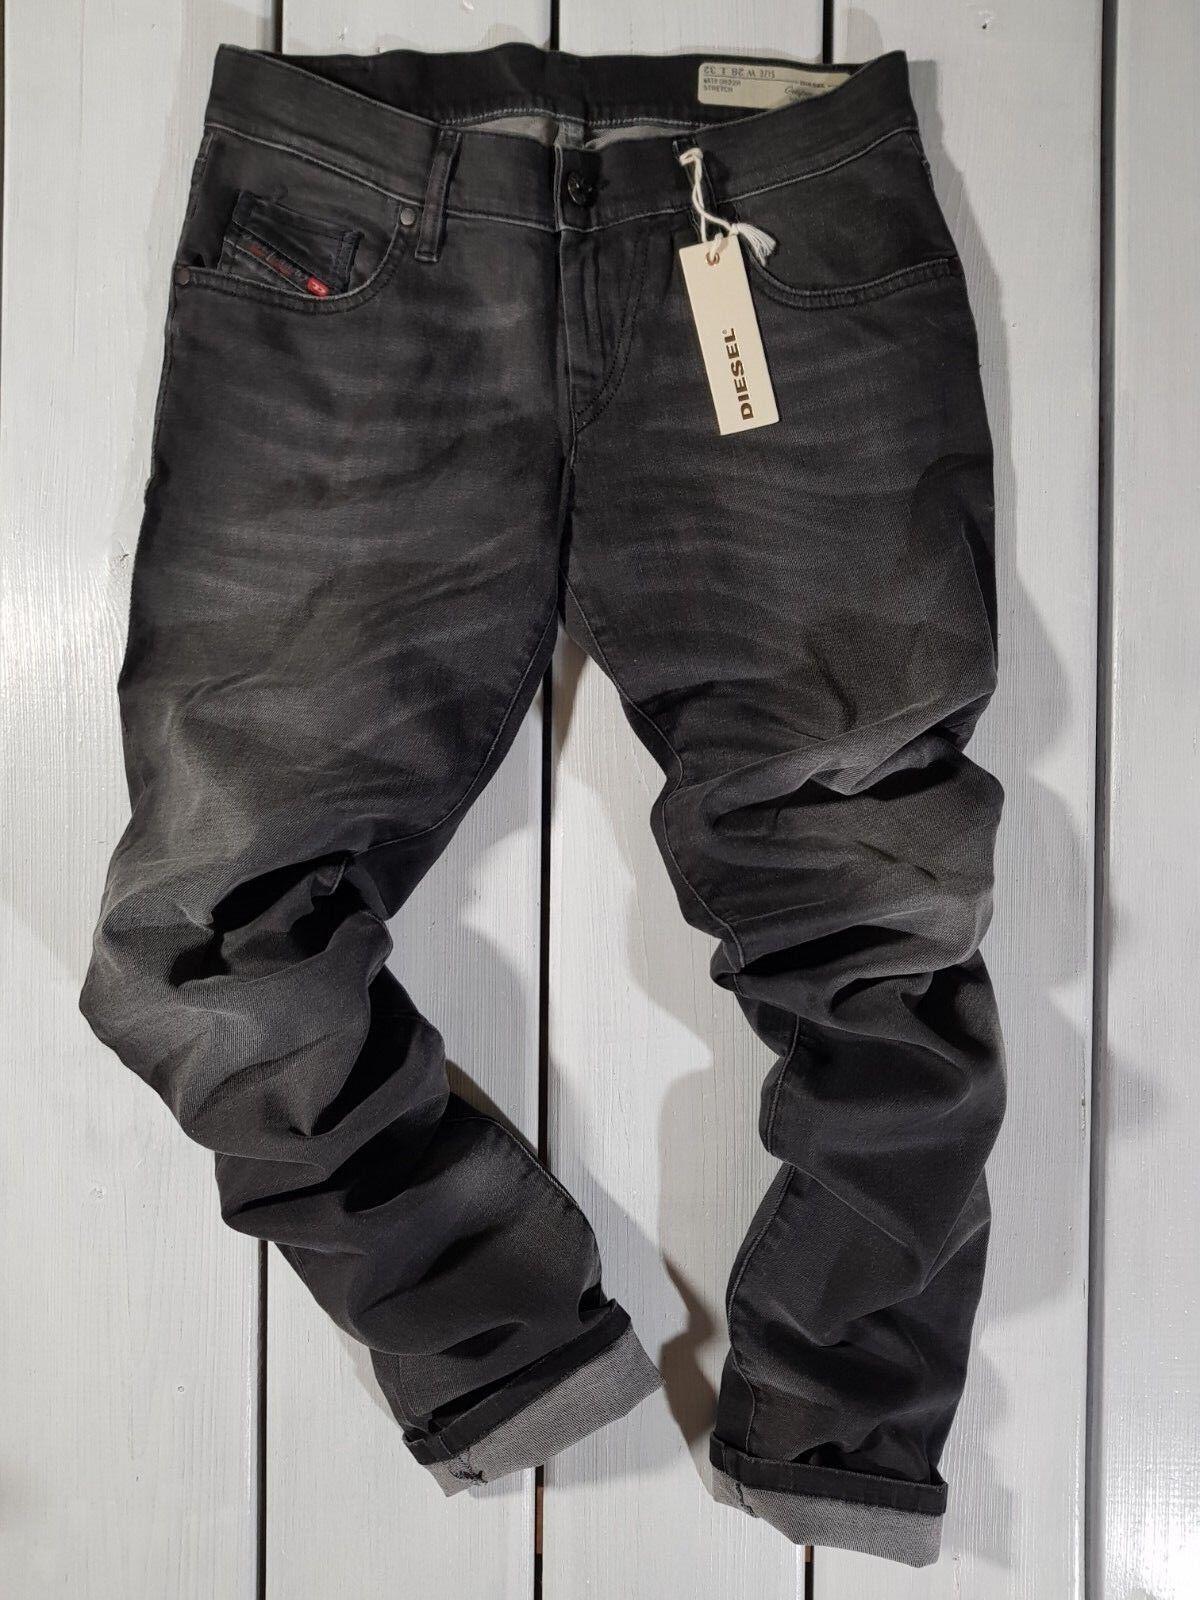 Neu Diesel DAMEN Jeans W28 L32 Grupee-Bzip 0822R Supereng Skinny